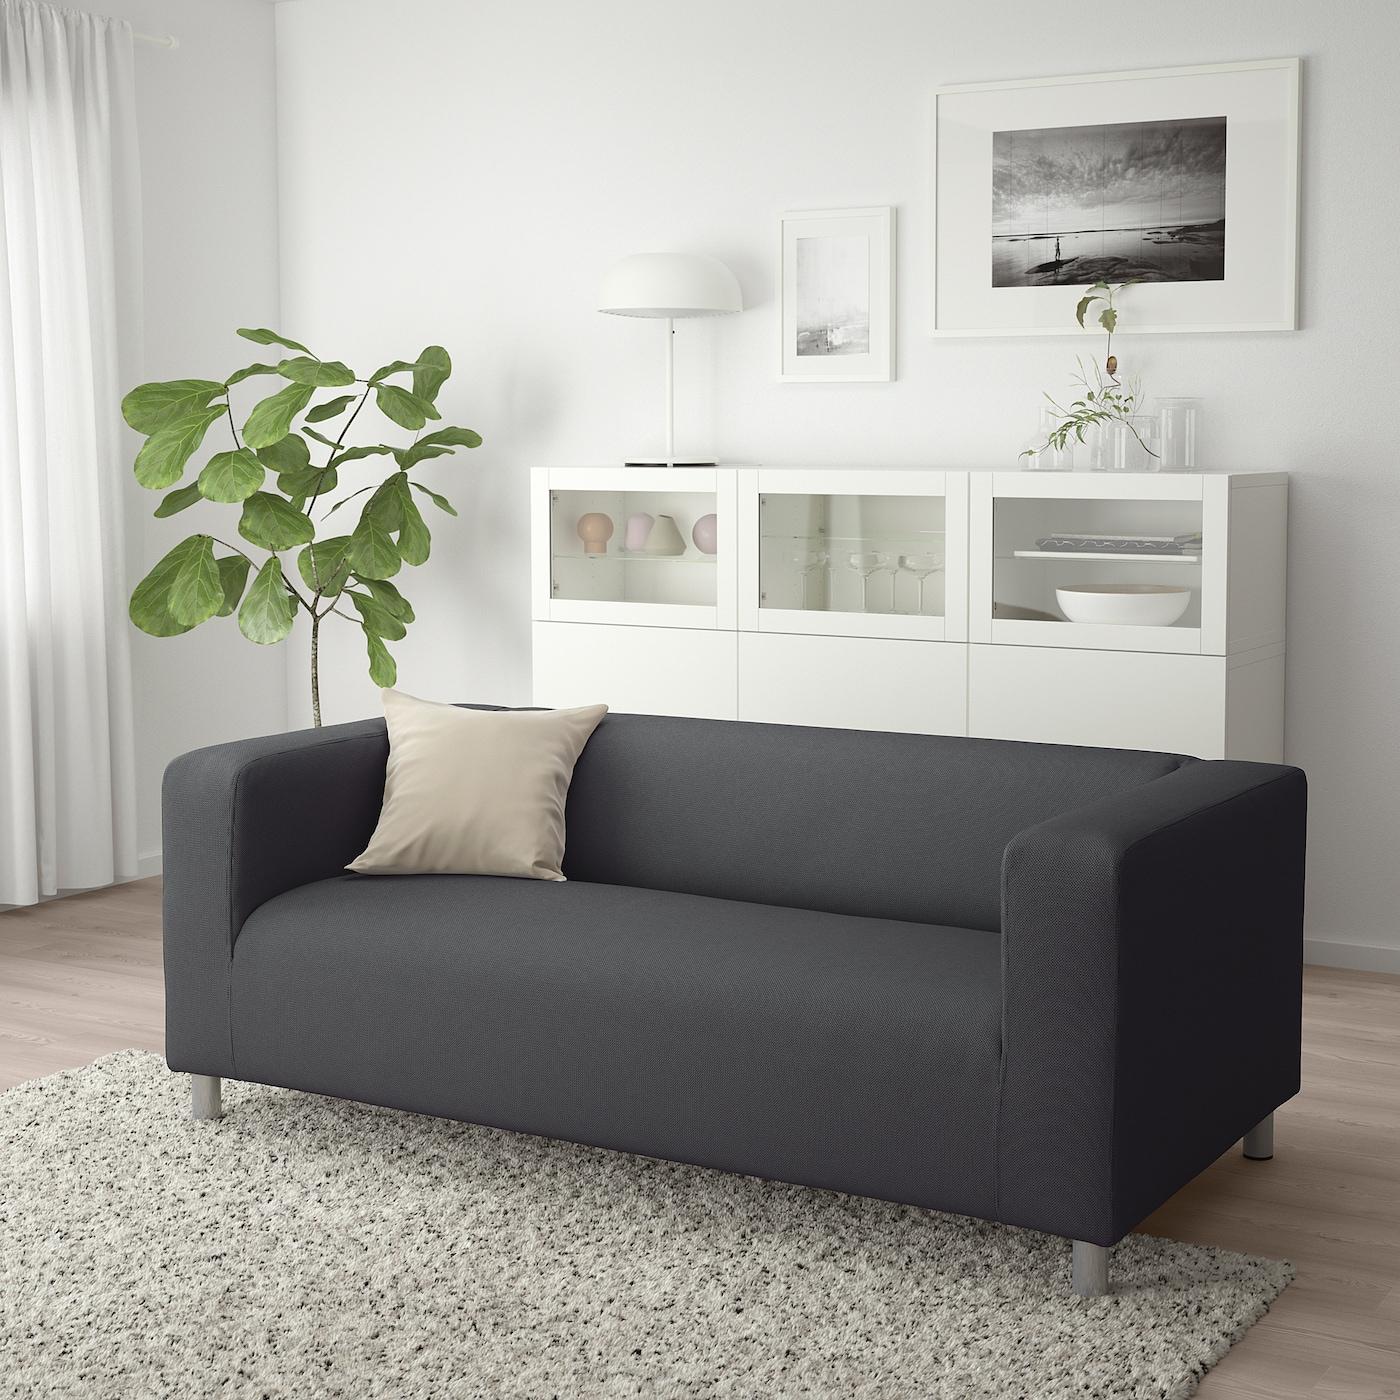 Leren Klippan Bank Ikea.Klippan 2 Zitsbank Vissle Grijs Ikea